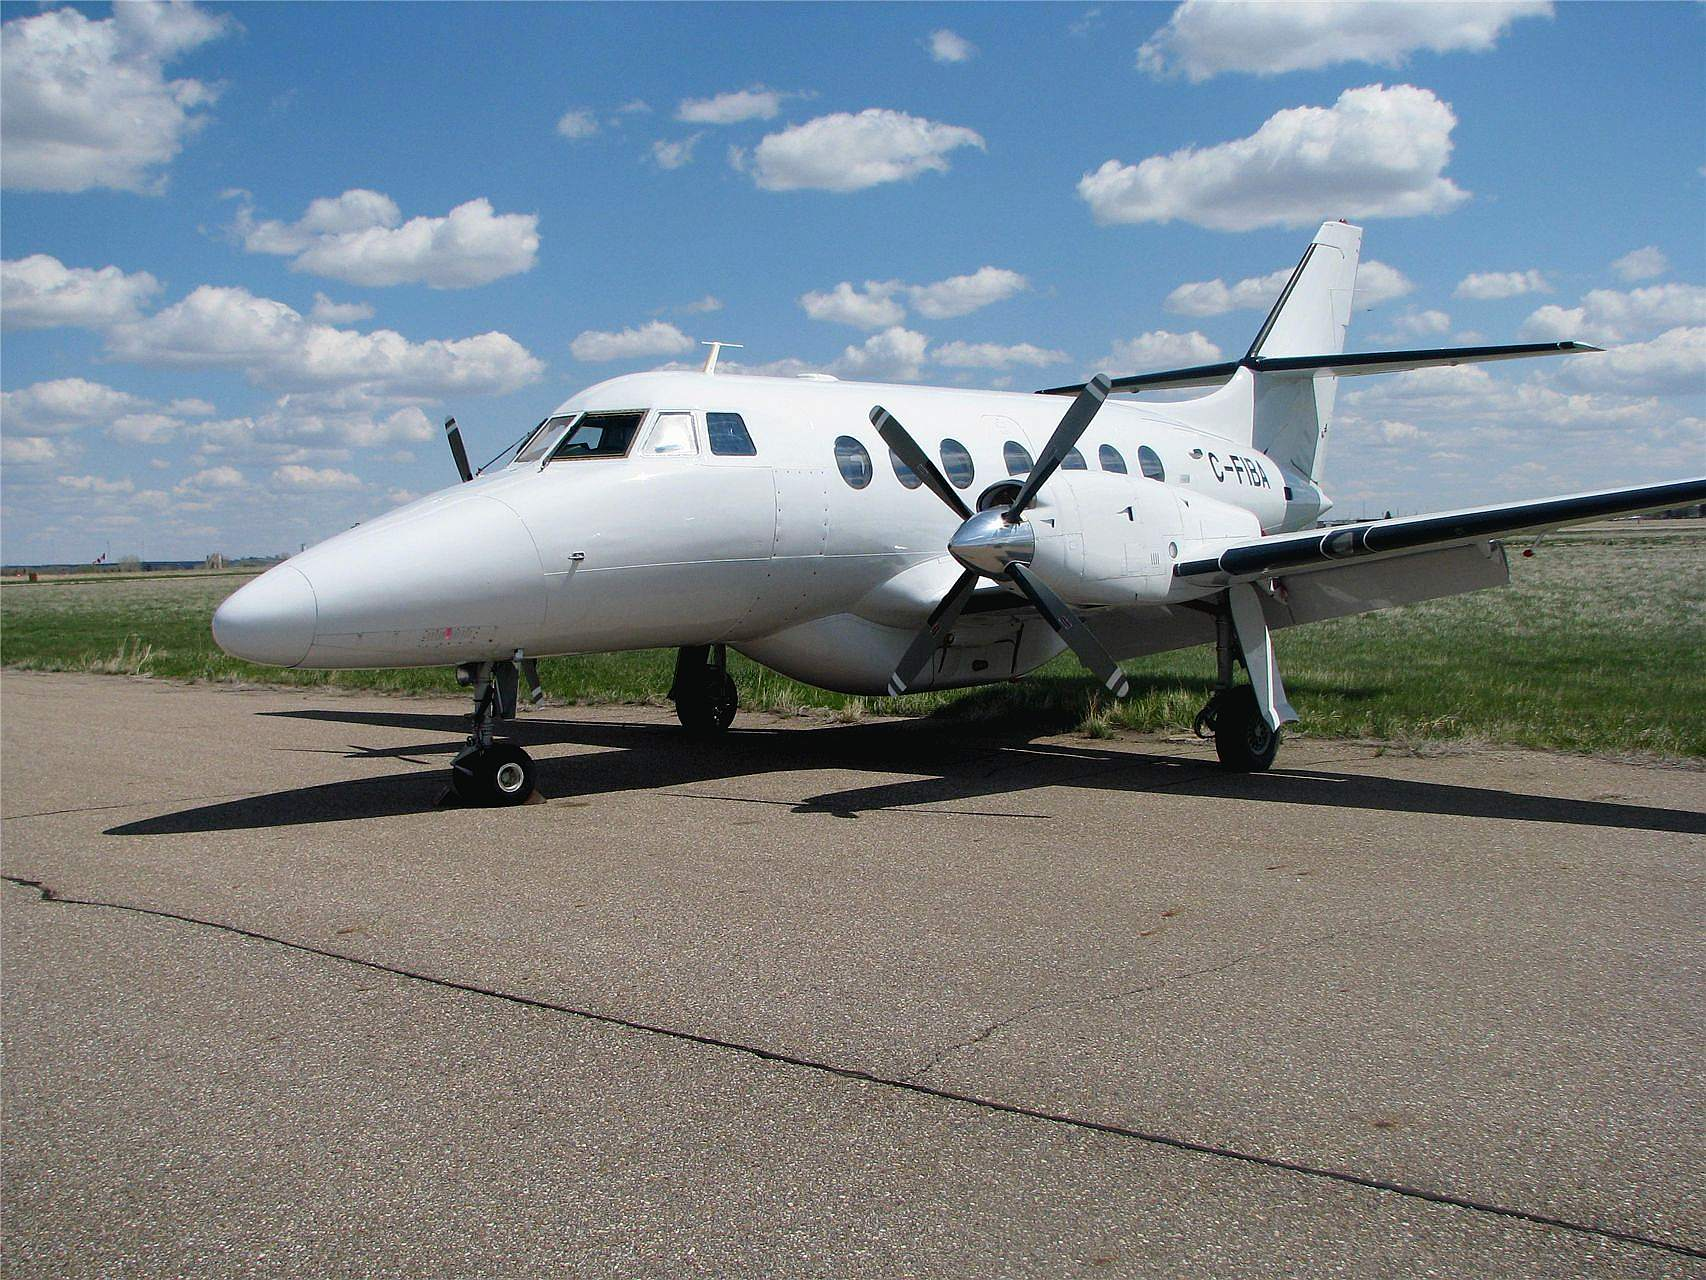 Eagle Airways Flight 2279